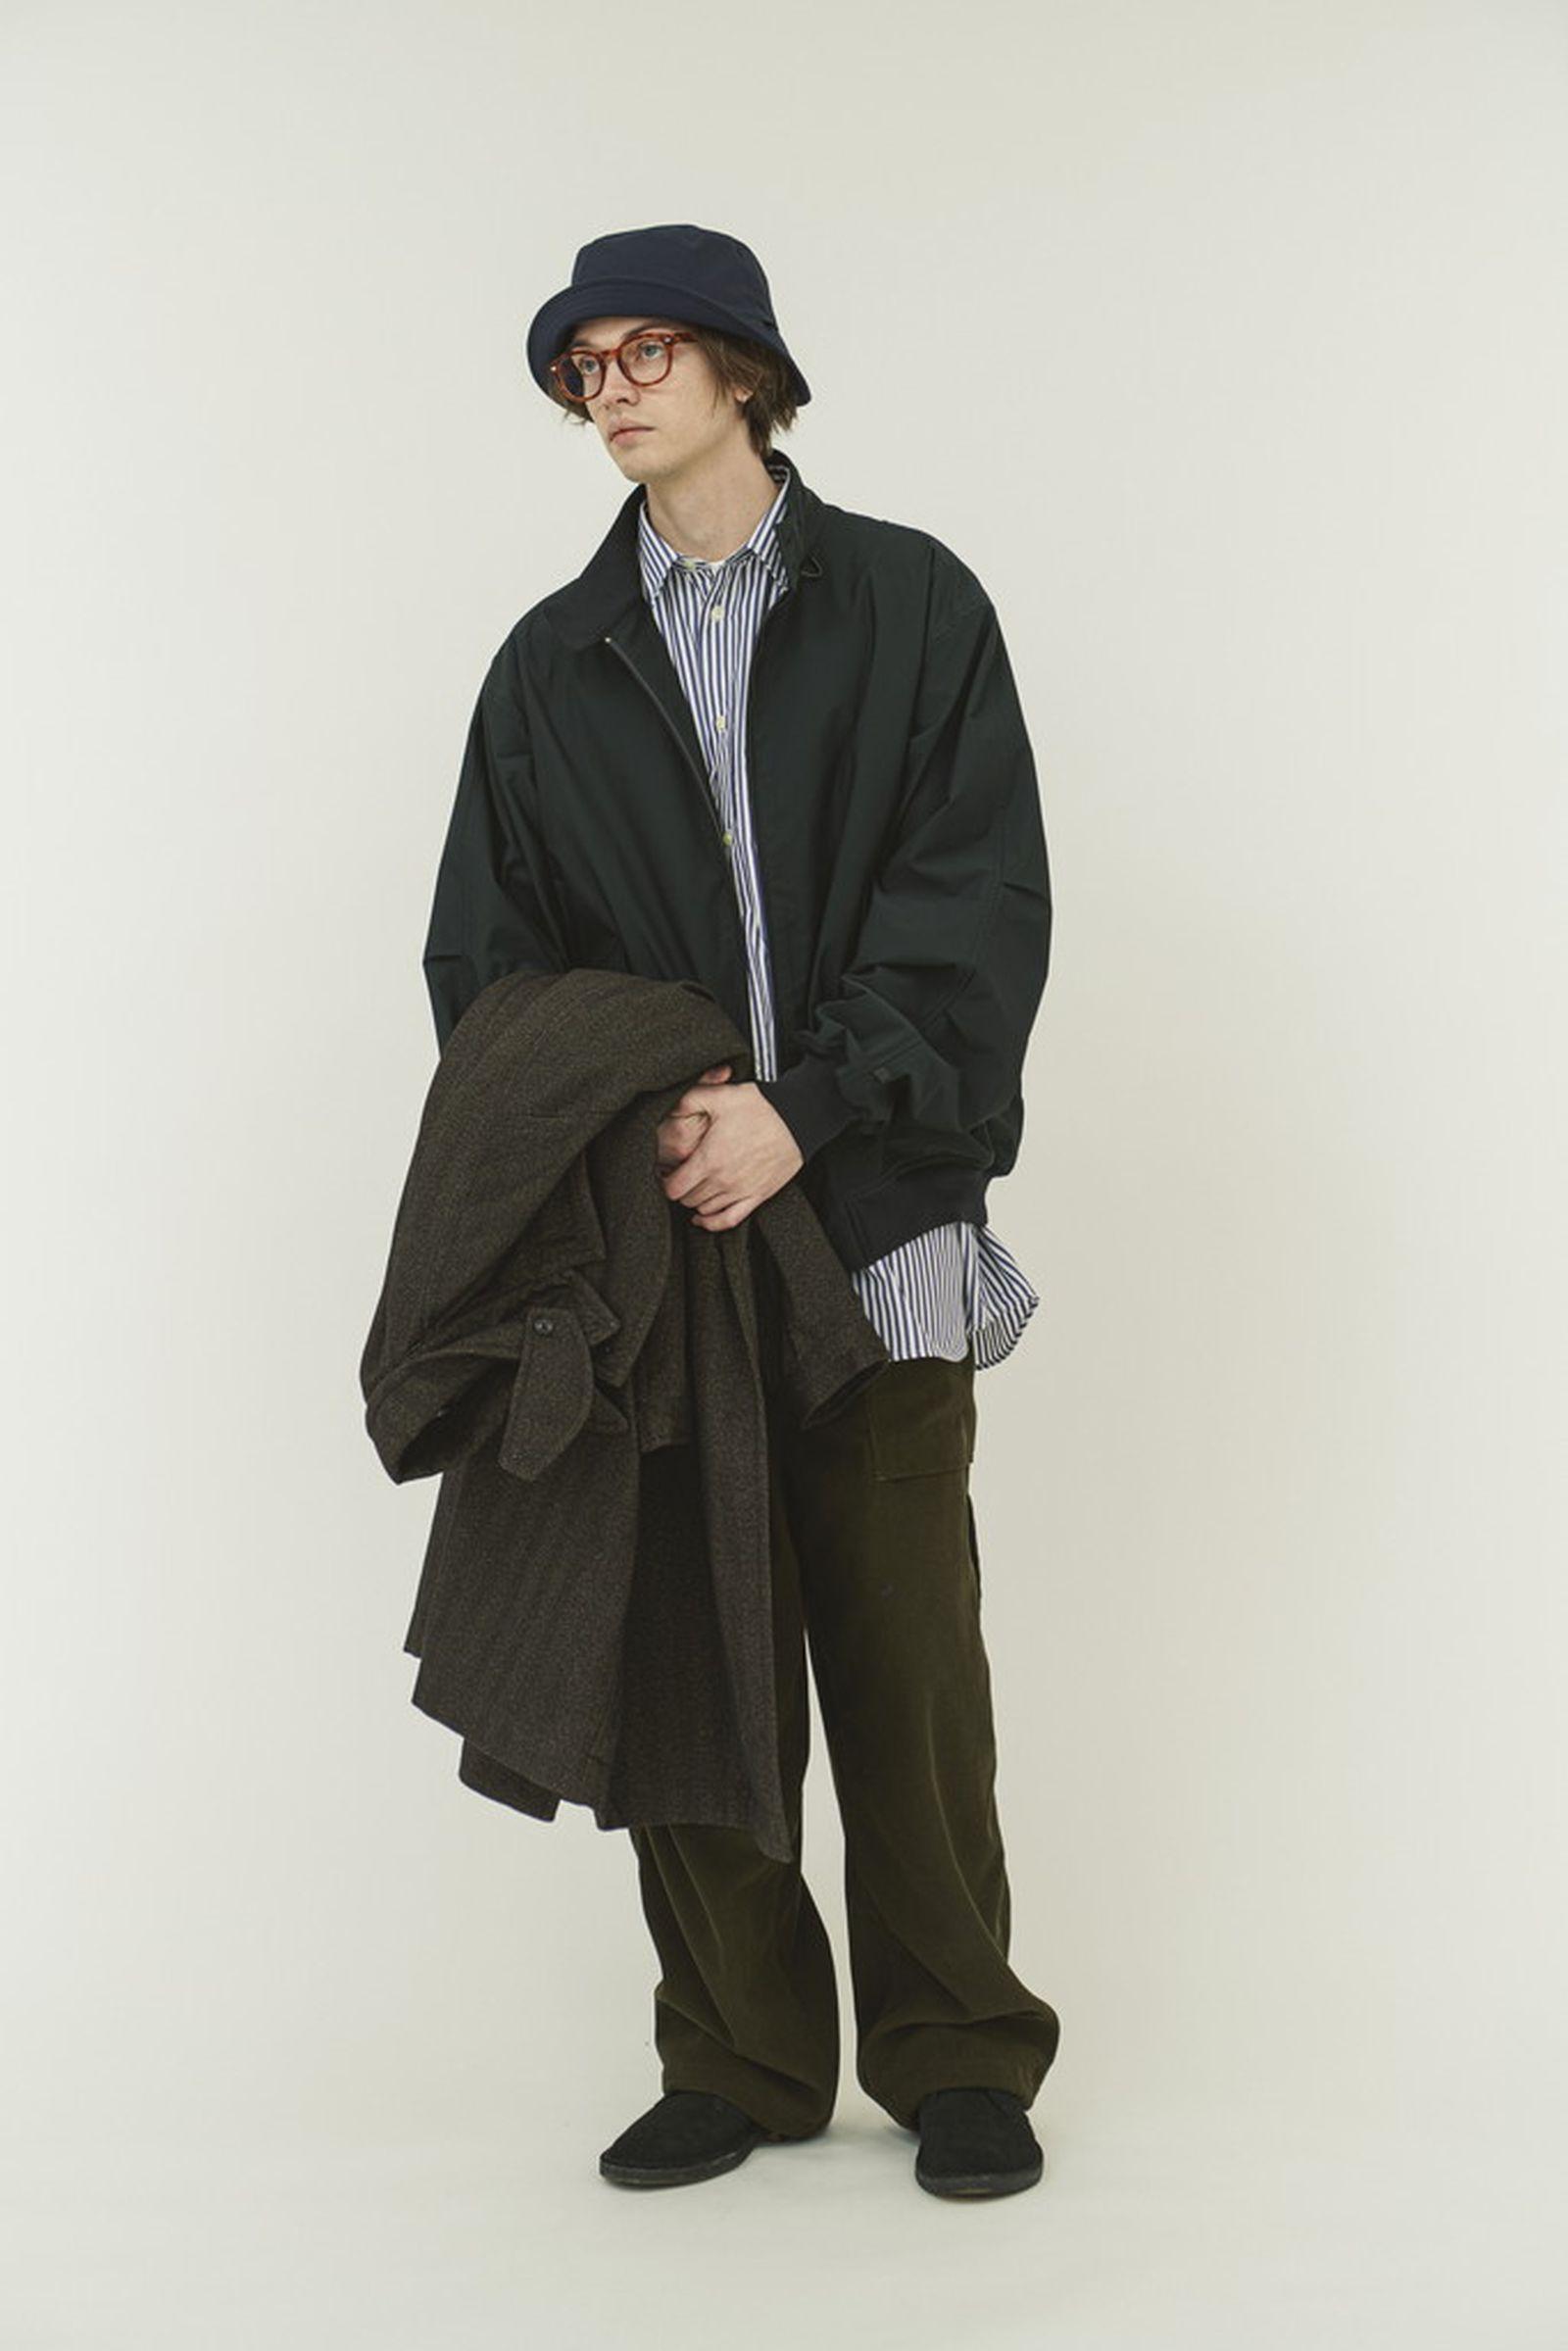 daiwa-pier39-fall-winter-2021-collection-09